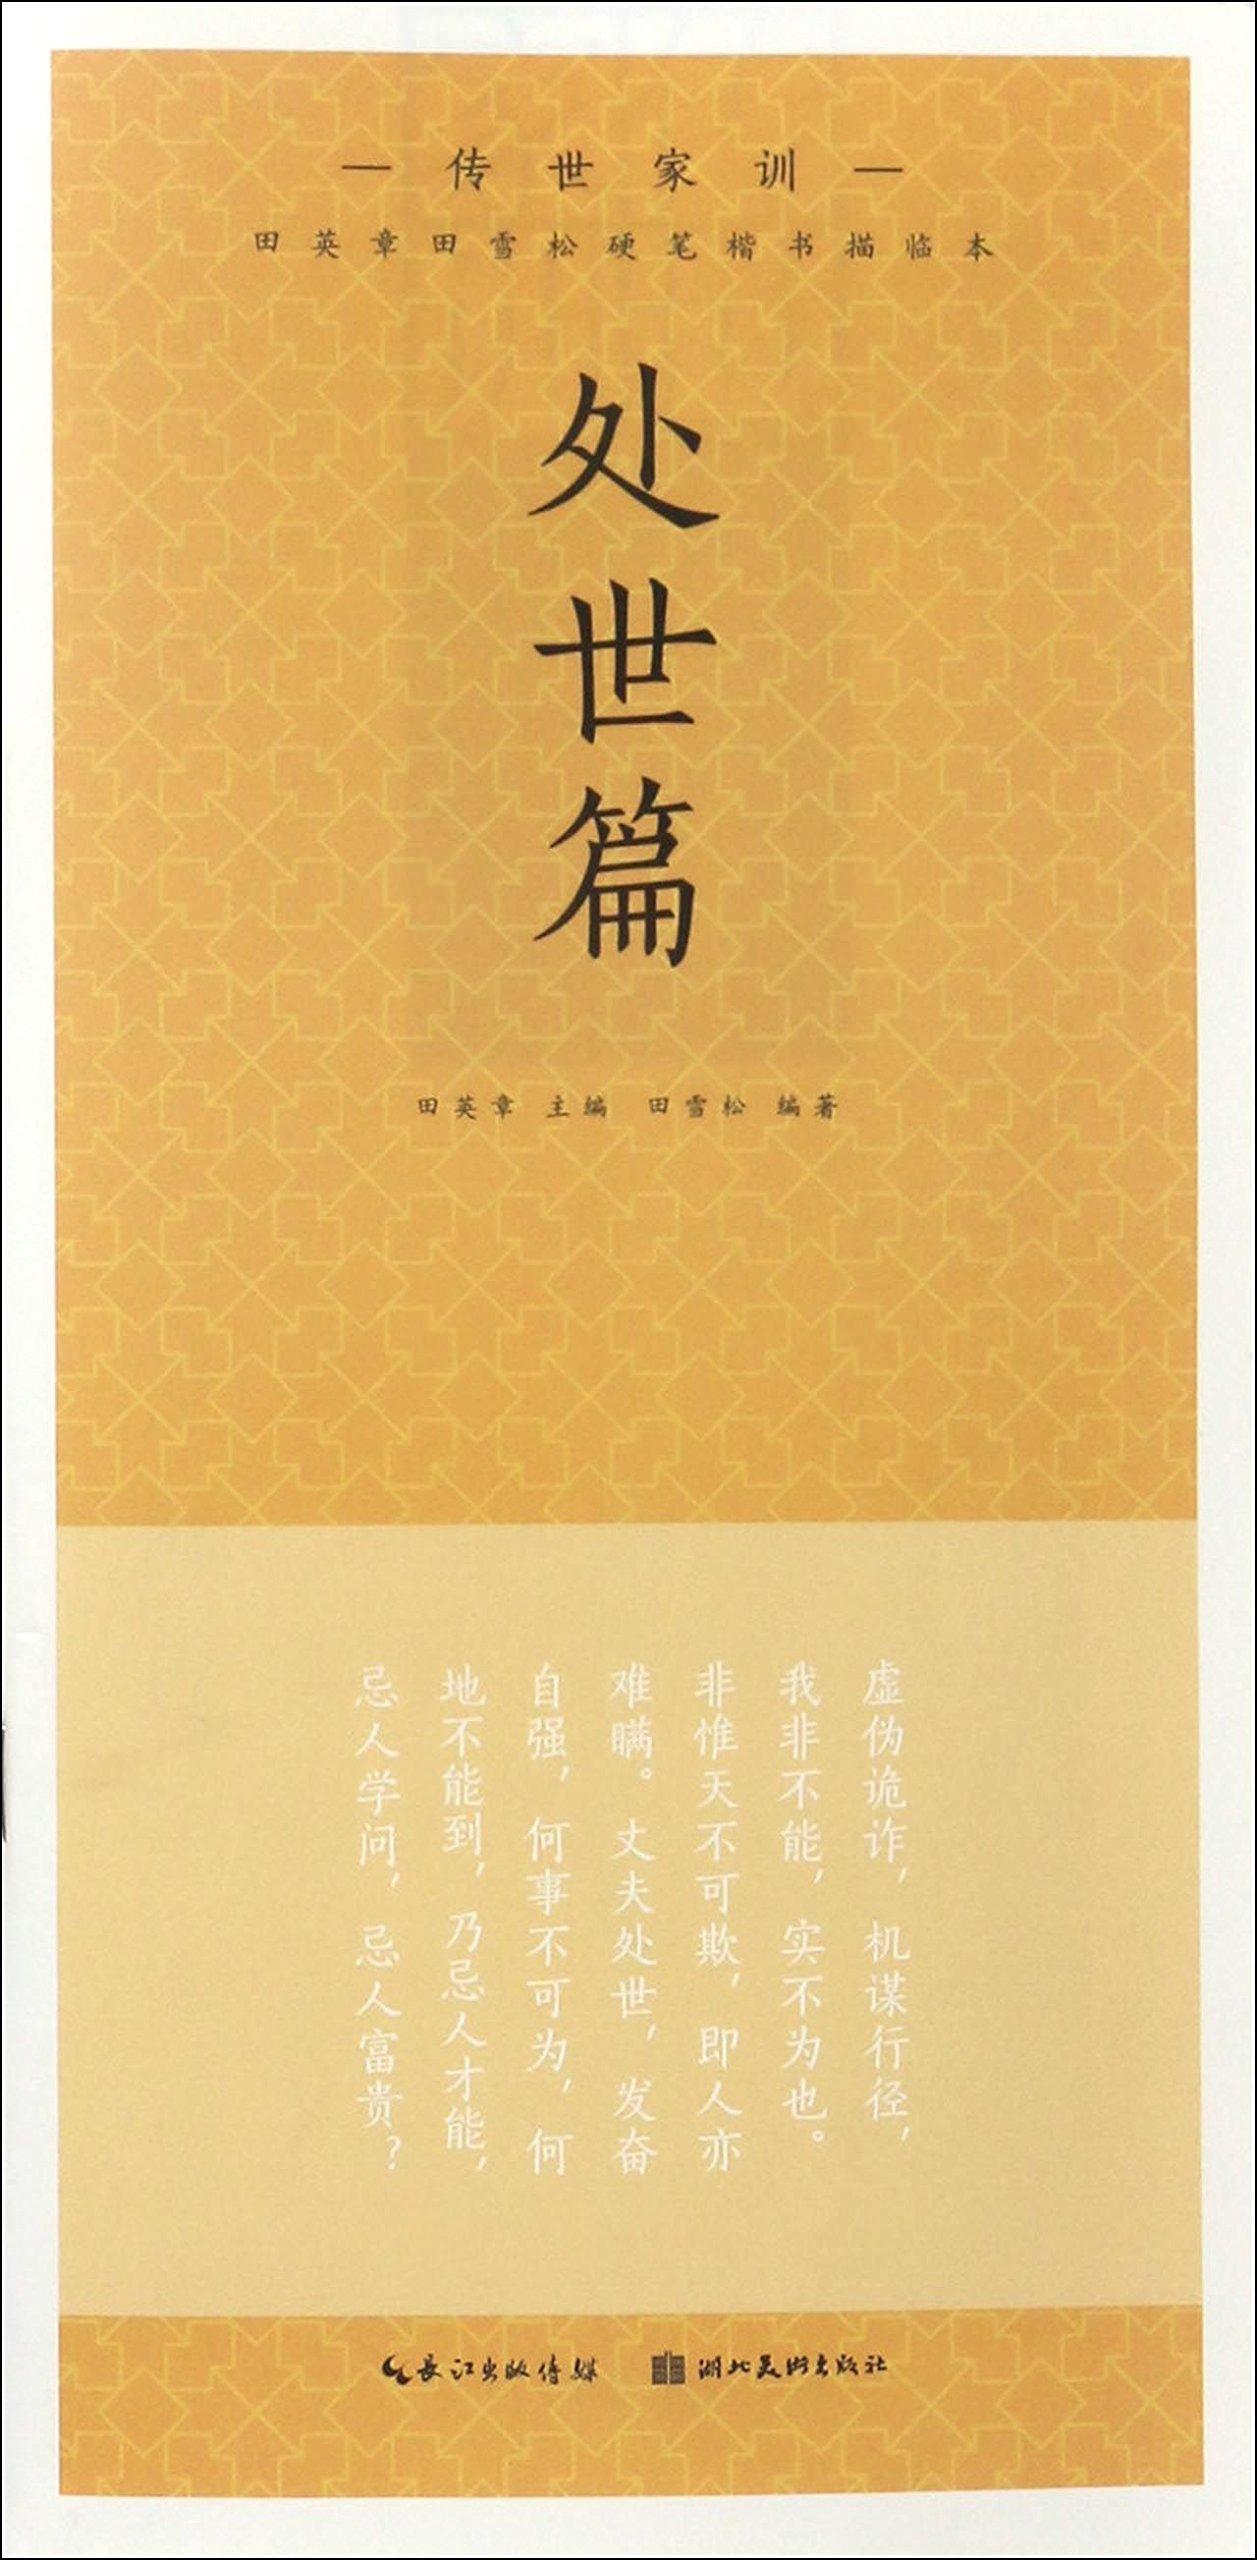 Classic Chinese Family Mottoes (Social Wisdom) (Chinese Edition) pdf epub